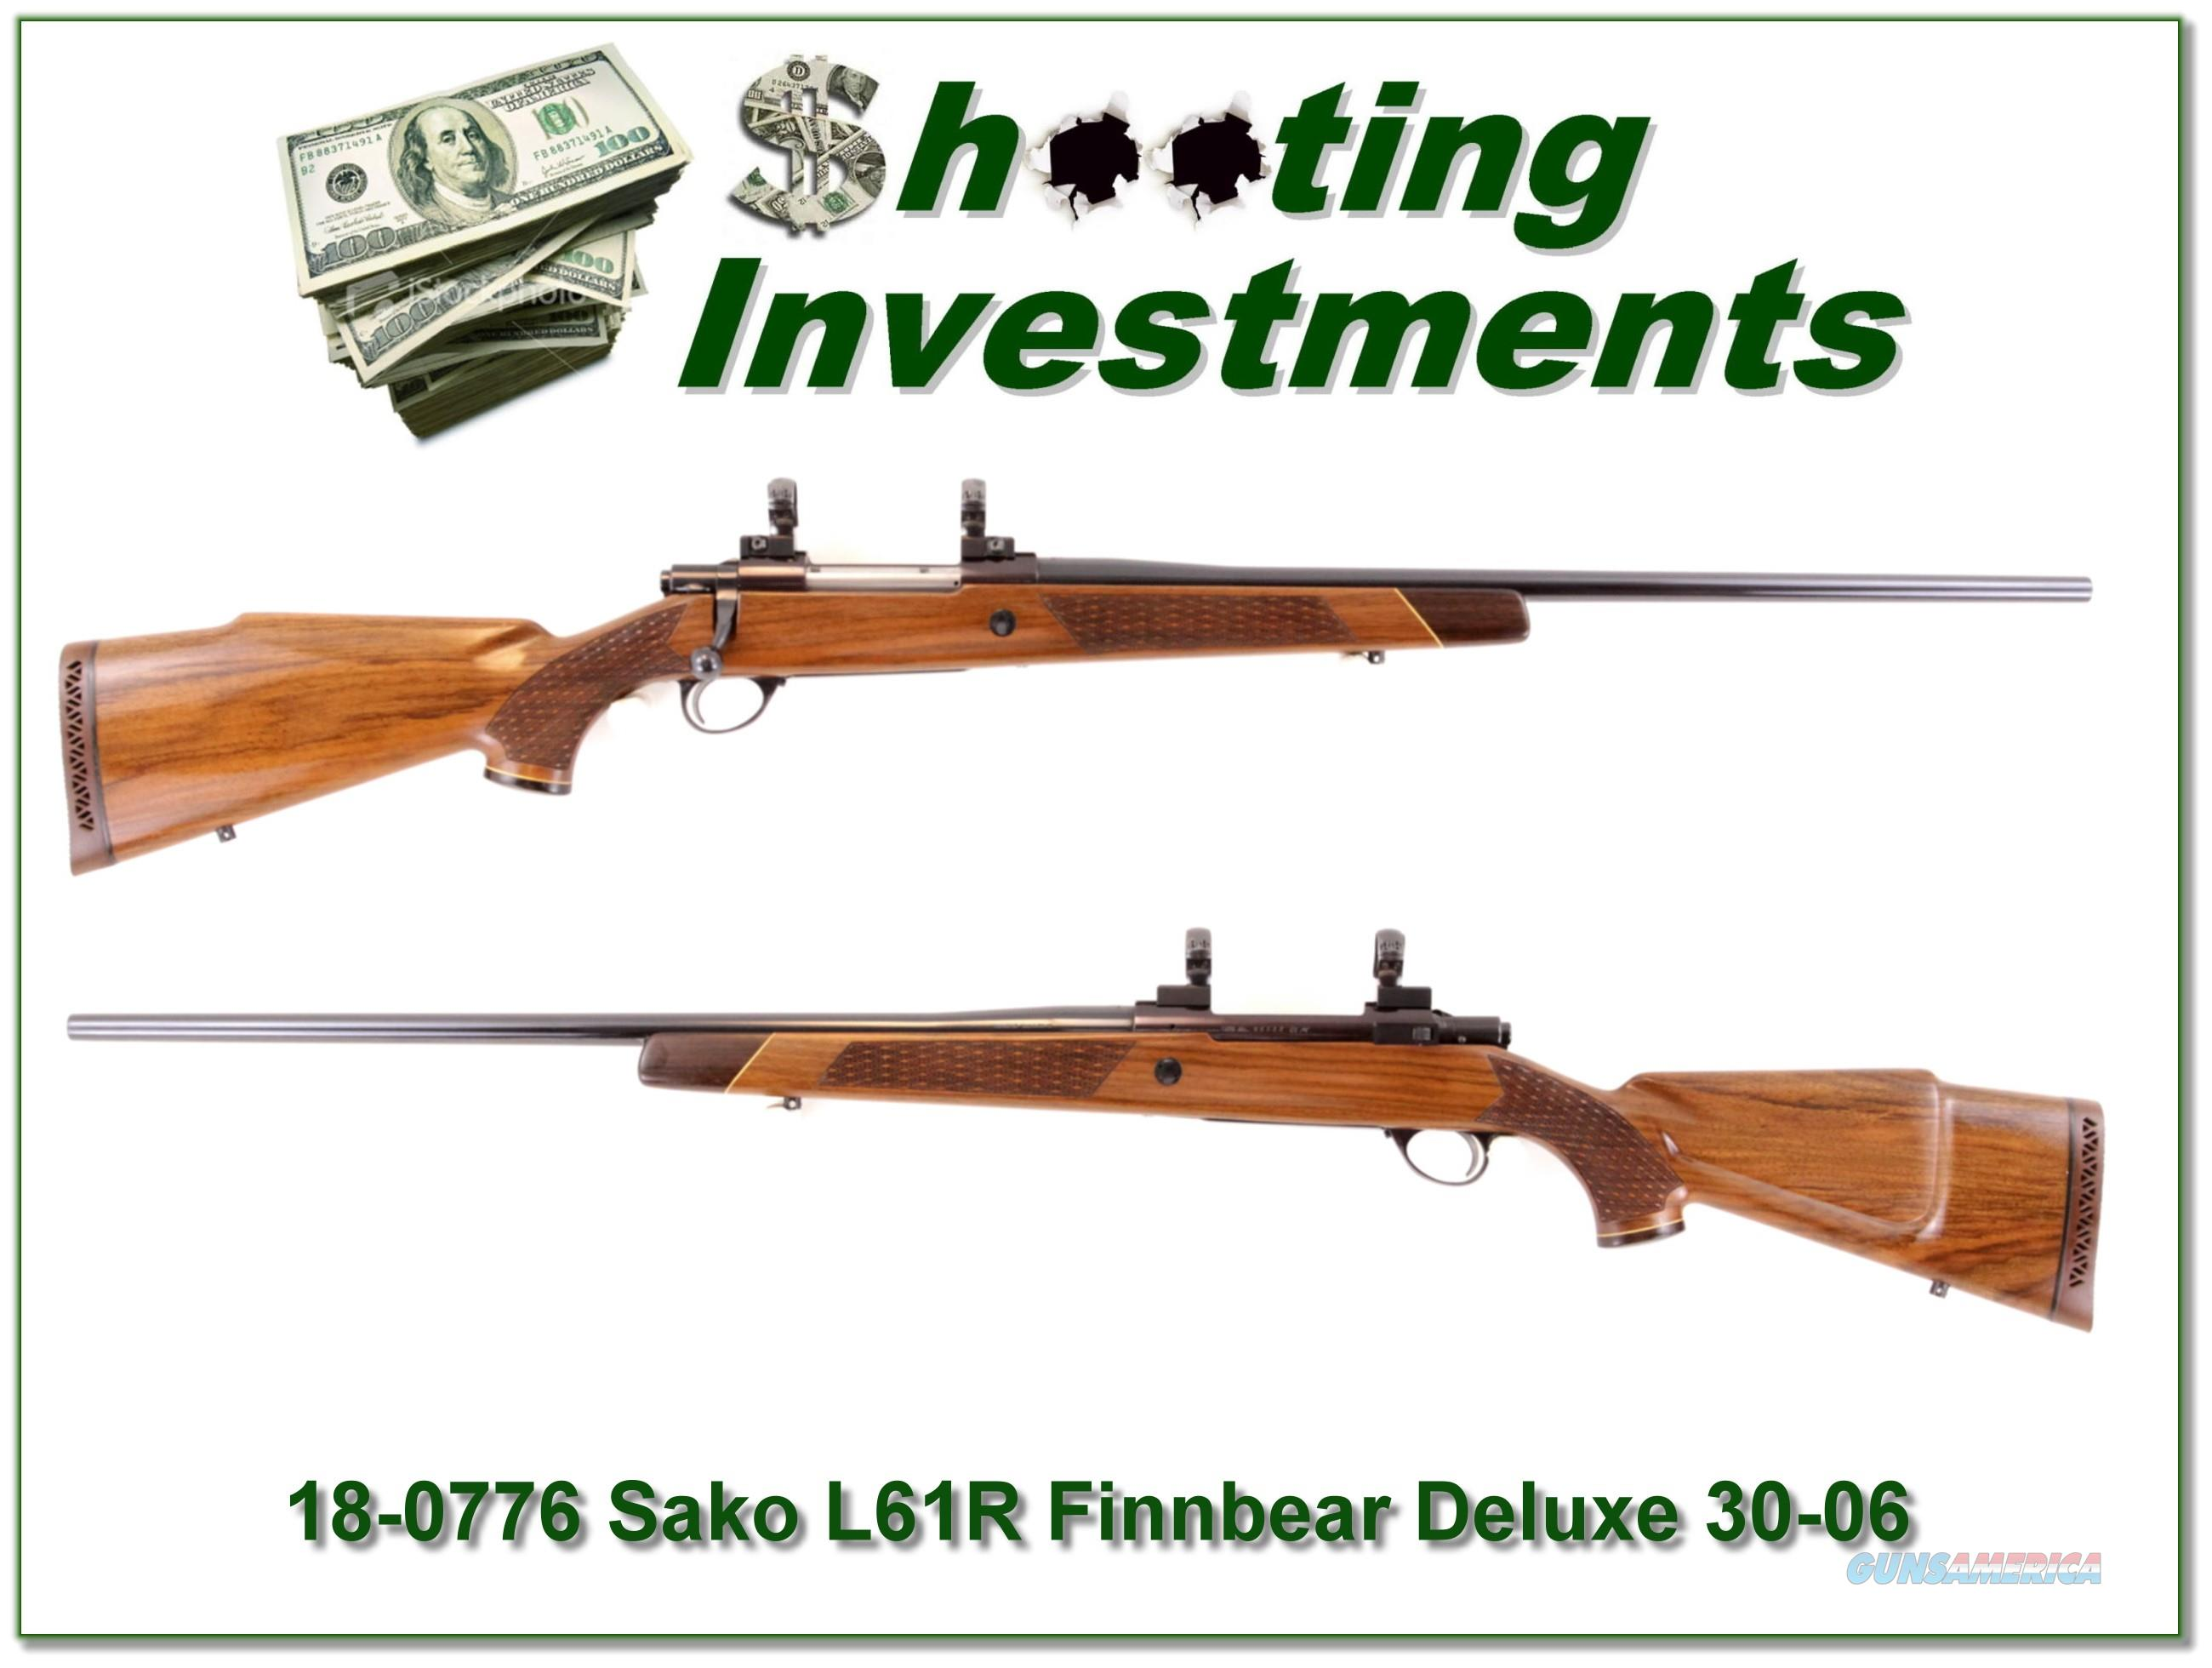 Sako L61R Finnbear Deluxe 30-06 very nice wood!  Guns > Rifles > Sako Rifles > Other Bolt Action